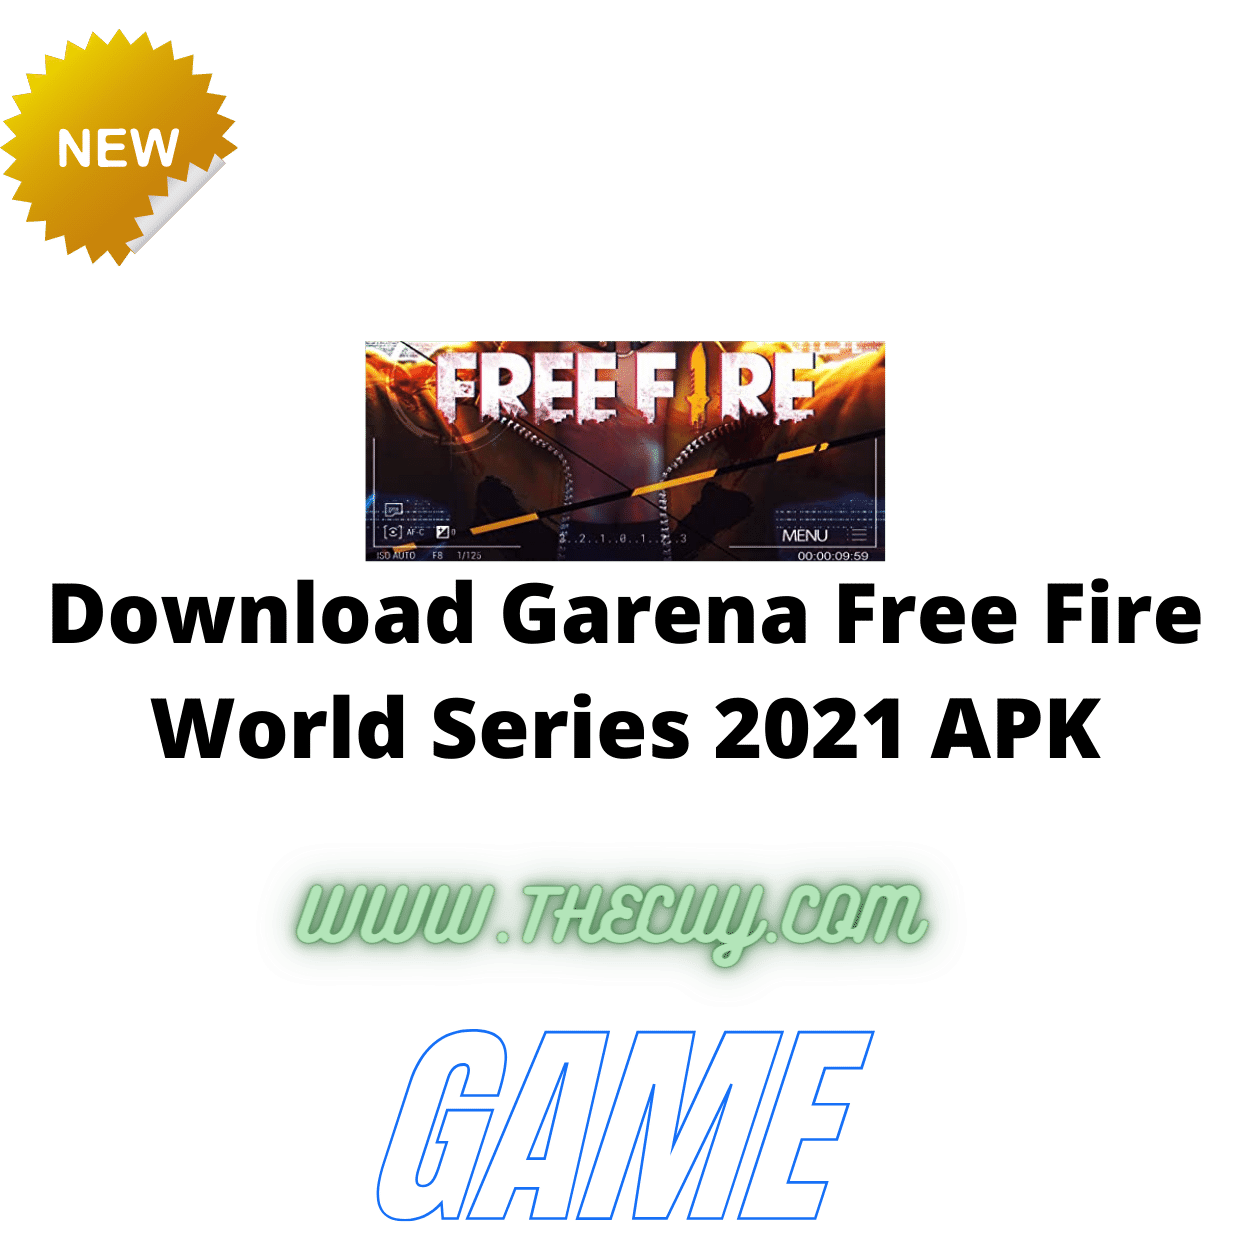 Download Garena Free Fire World Series 2021 APK